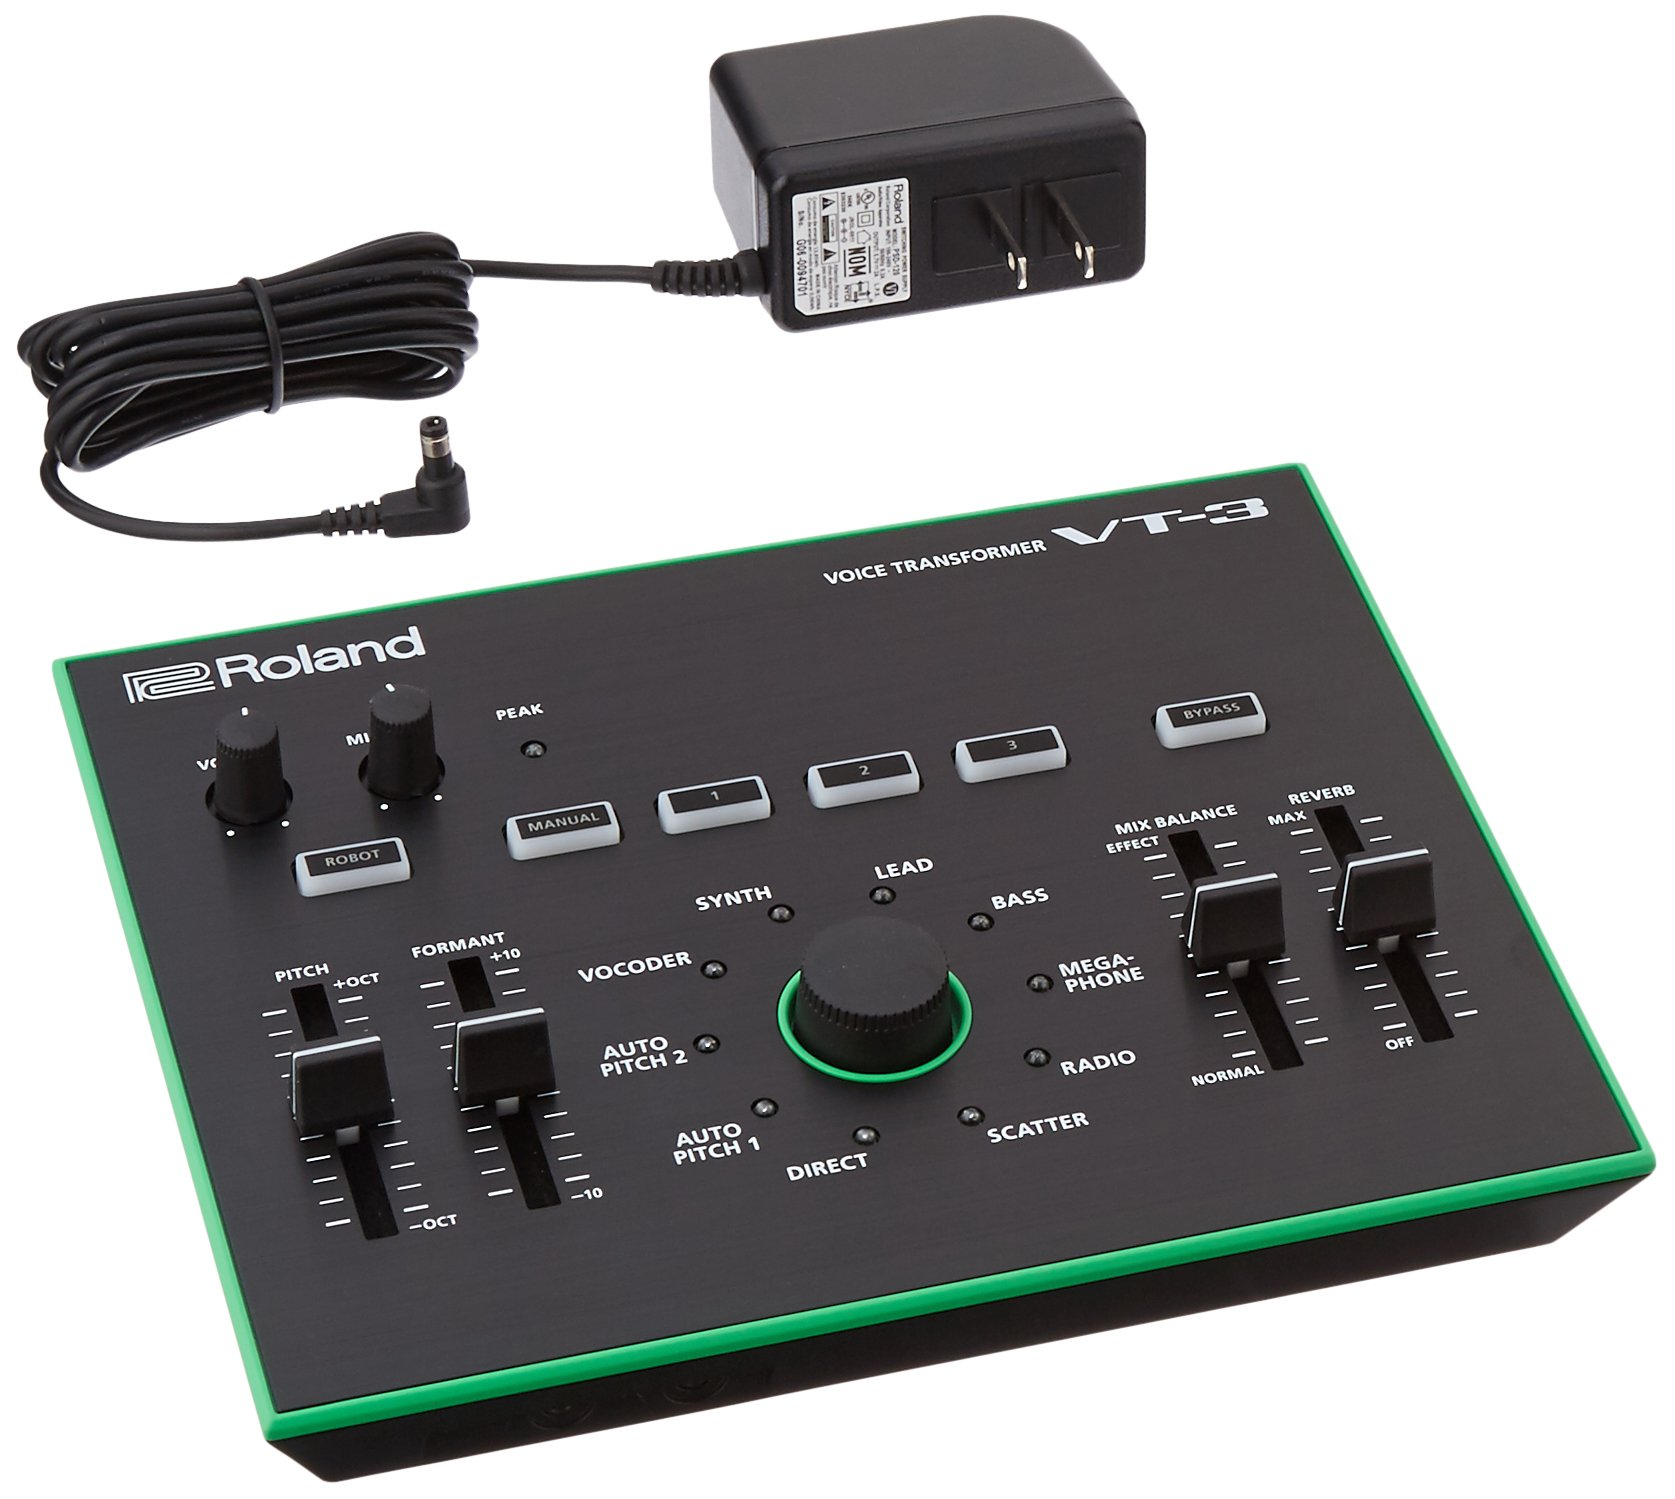 ROLAND VT-3 Vocal effect processors